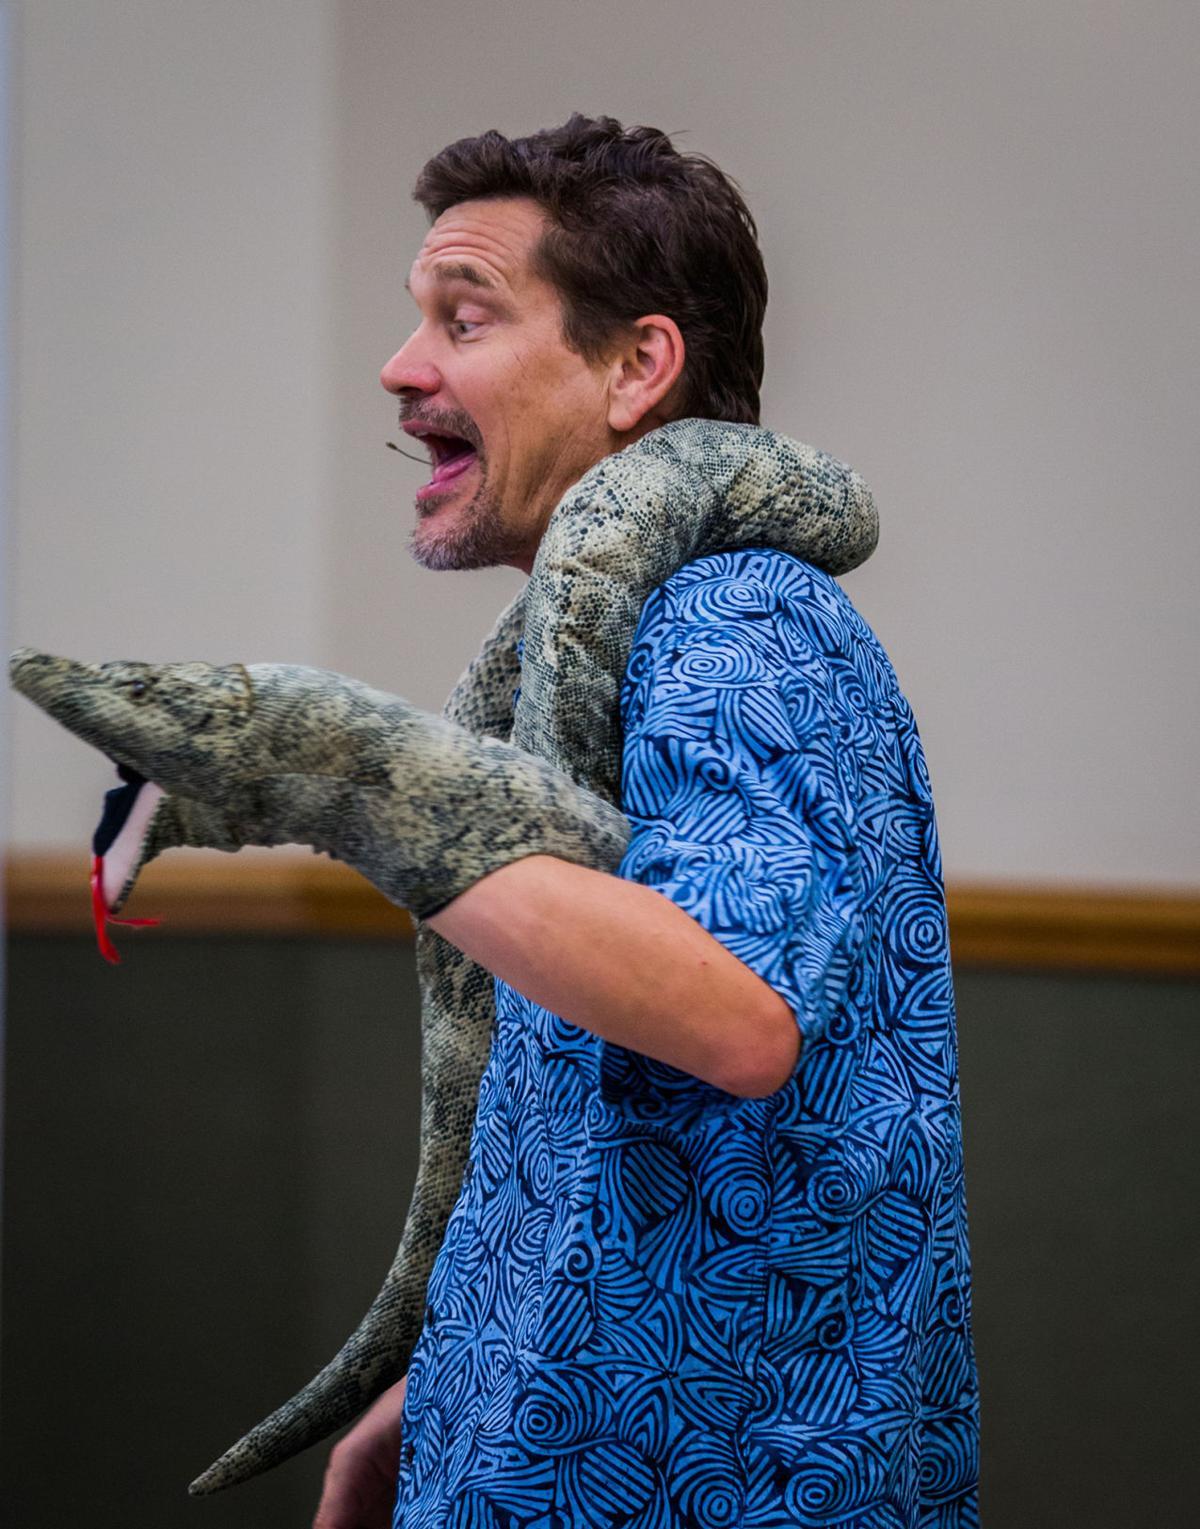 Singing-Zoologist-2.jpg